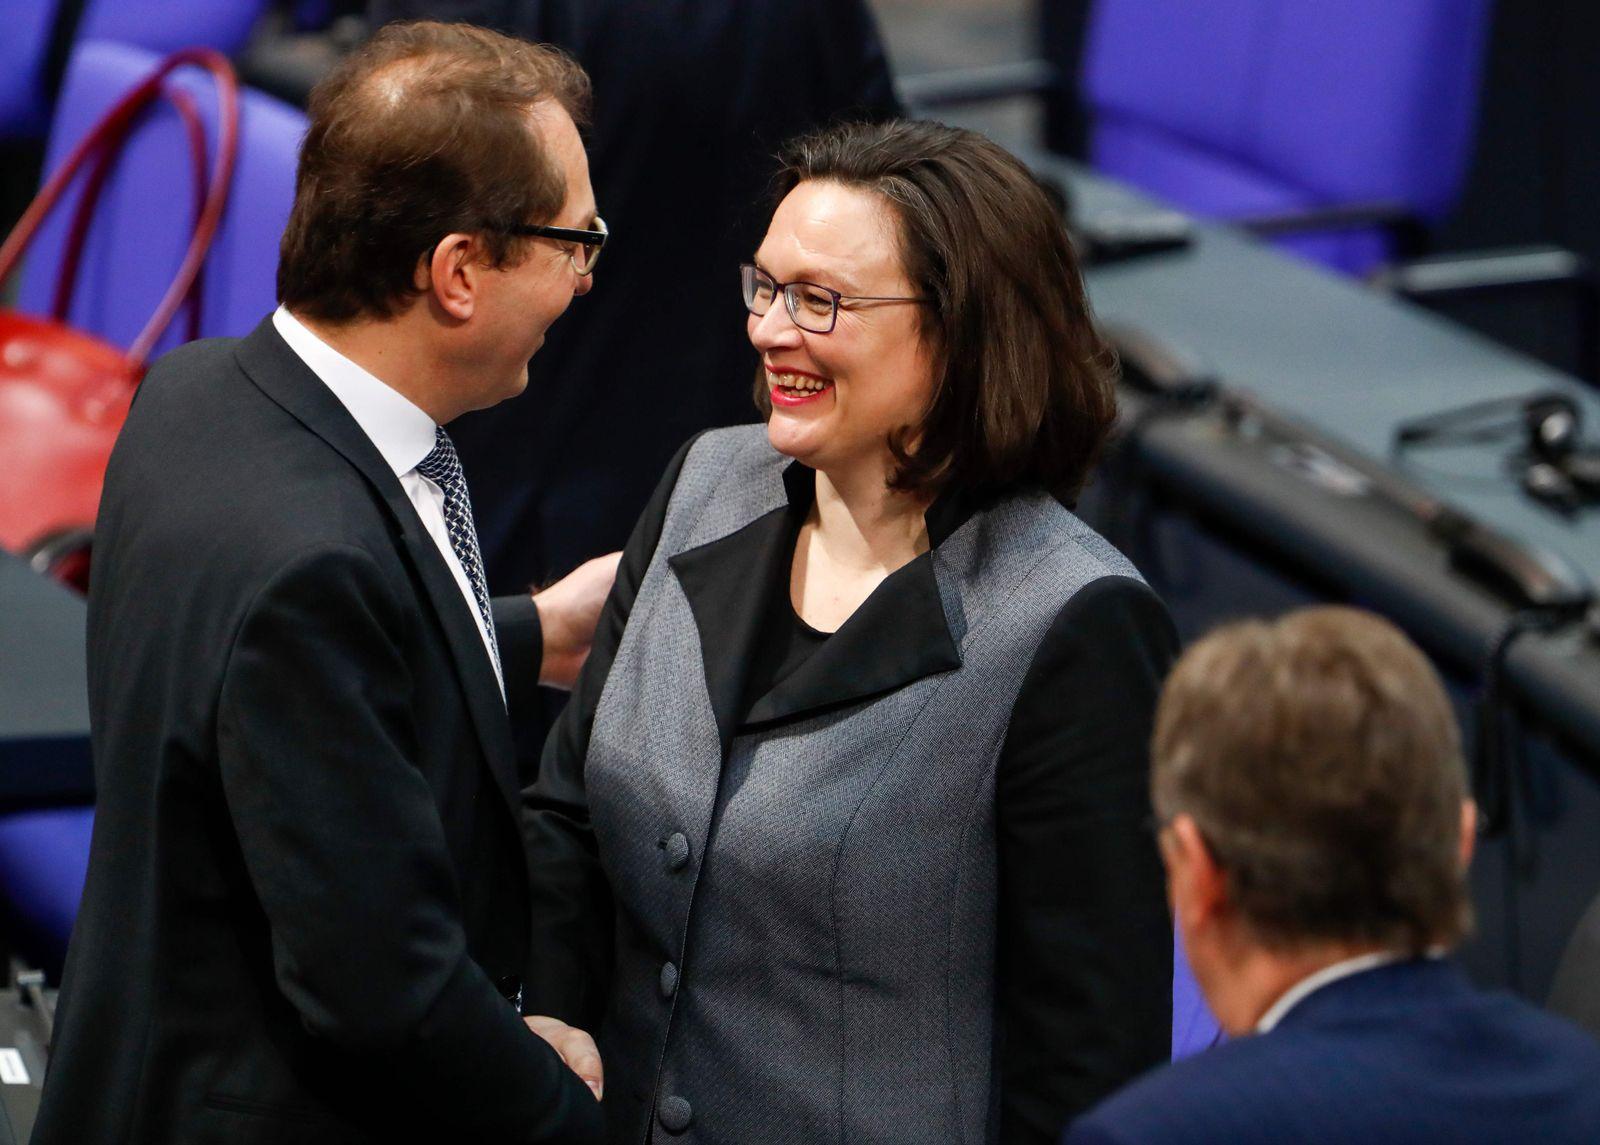 GERMANY-FRANCE-EUROPE-DIPLOMACY-POLITICS-PARLIAMENT